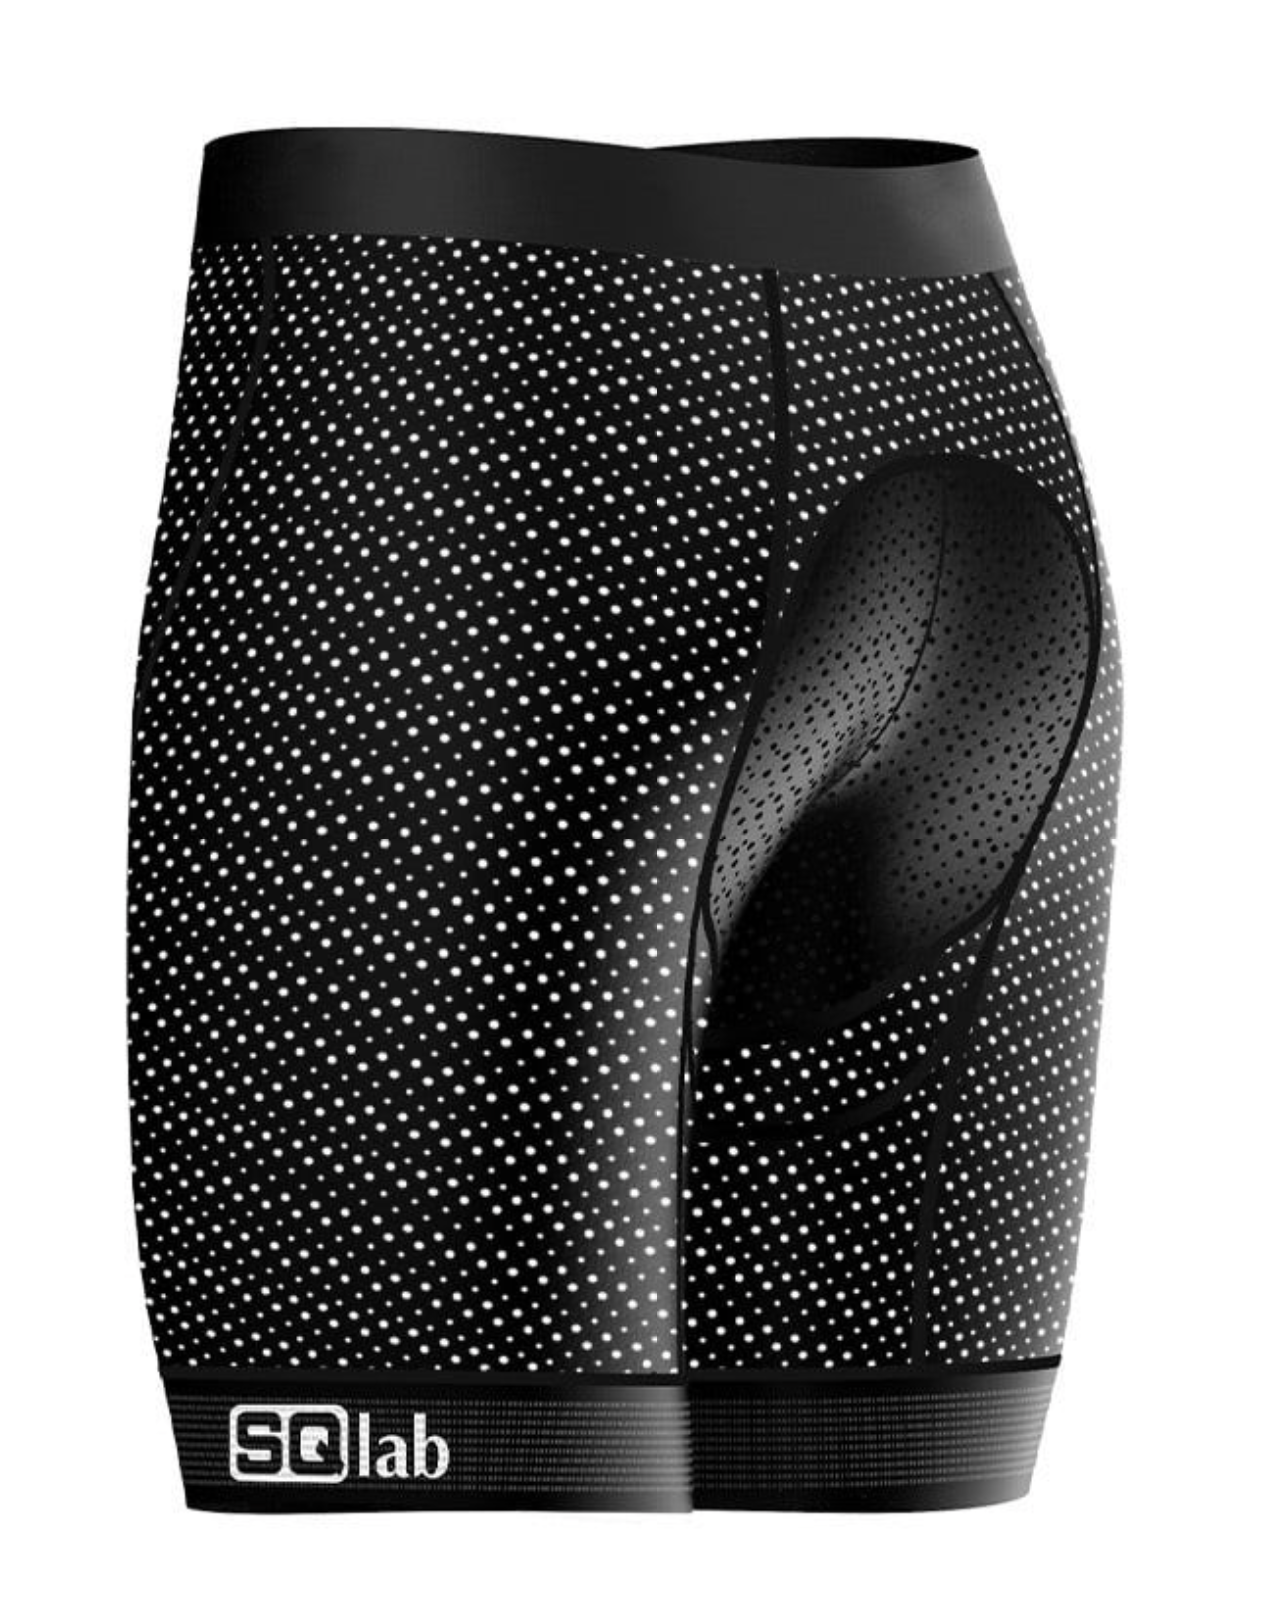 SQlab SQ-Short ONE10